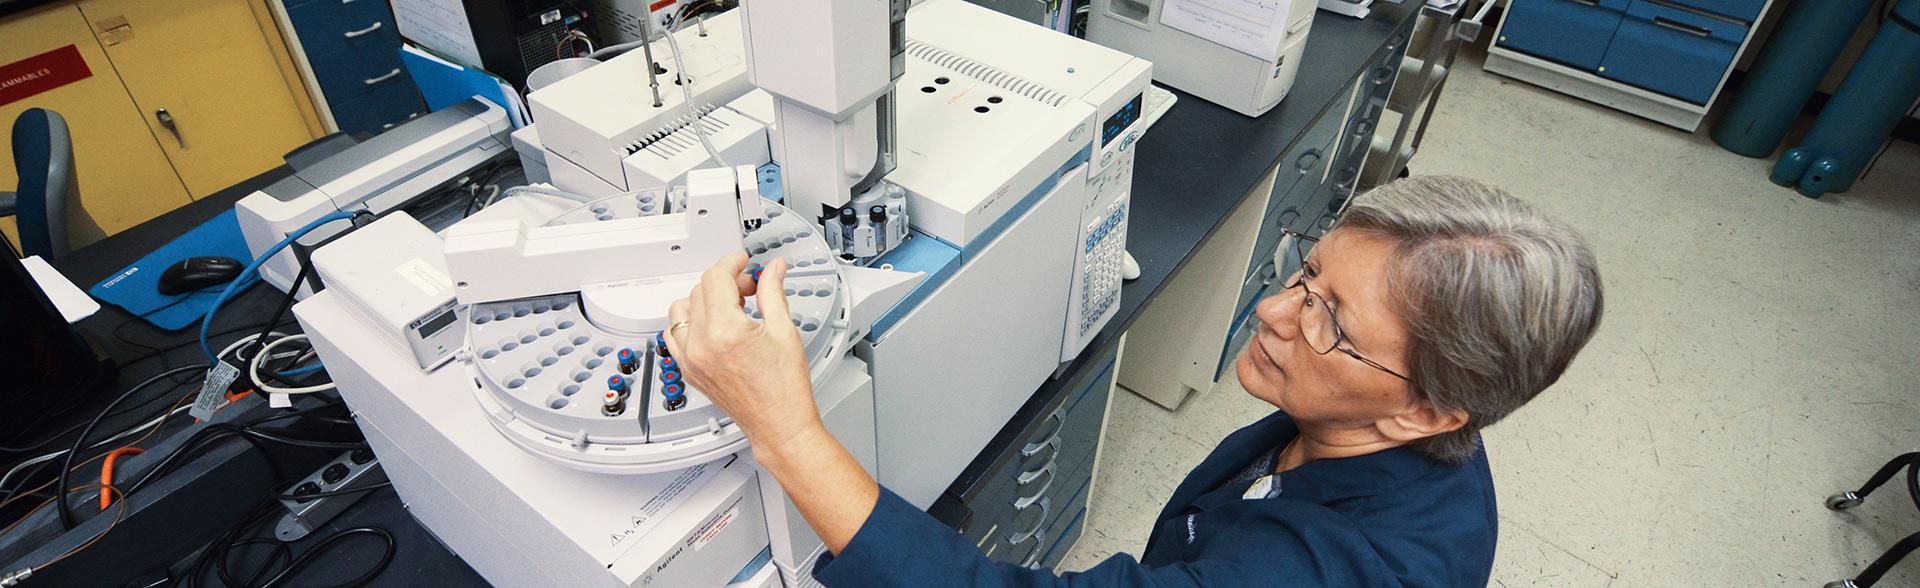 Auto- sampler on GC-MS reduces turnaround time